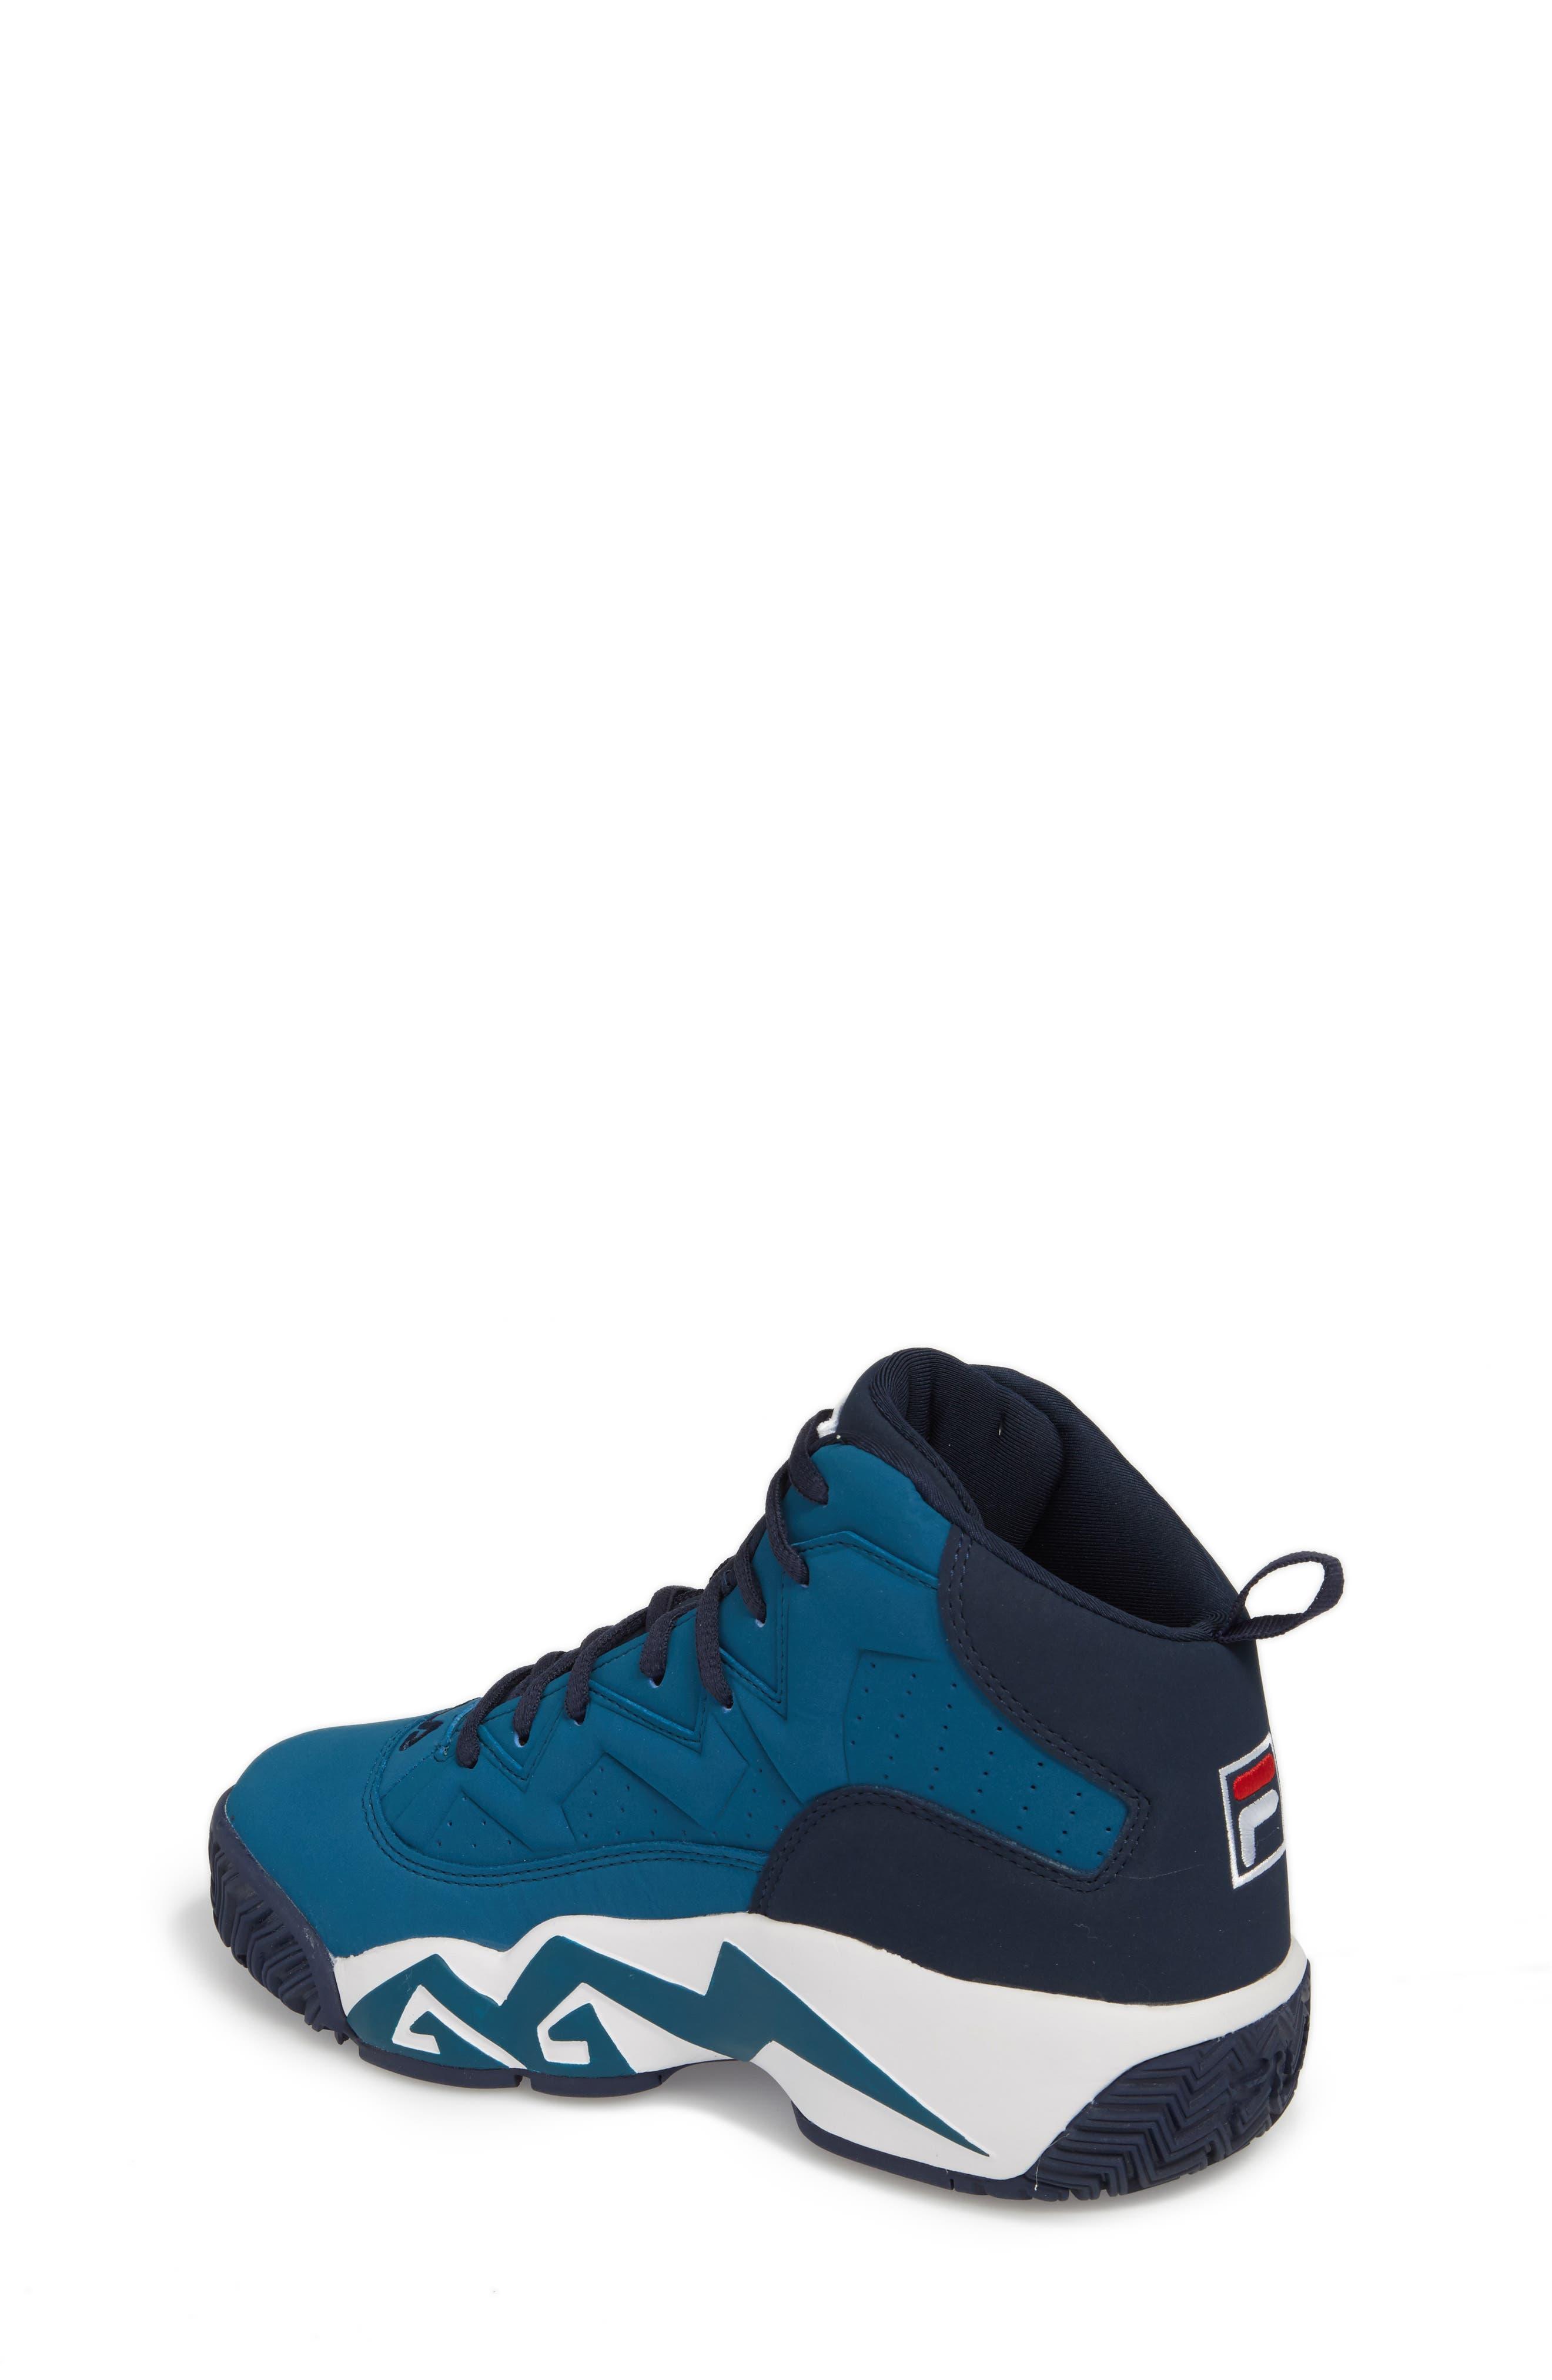 MB High Top Sneaker,                             Alternate thumbnail 2, color,                             INK BLUE/ FILA NAVY